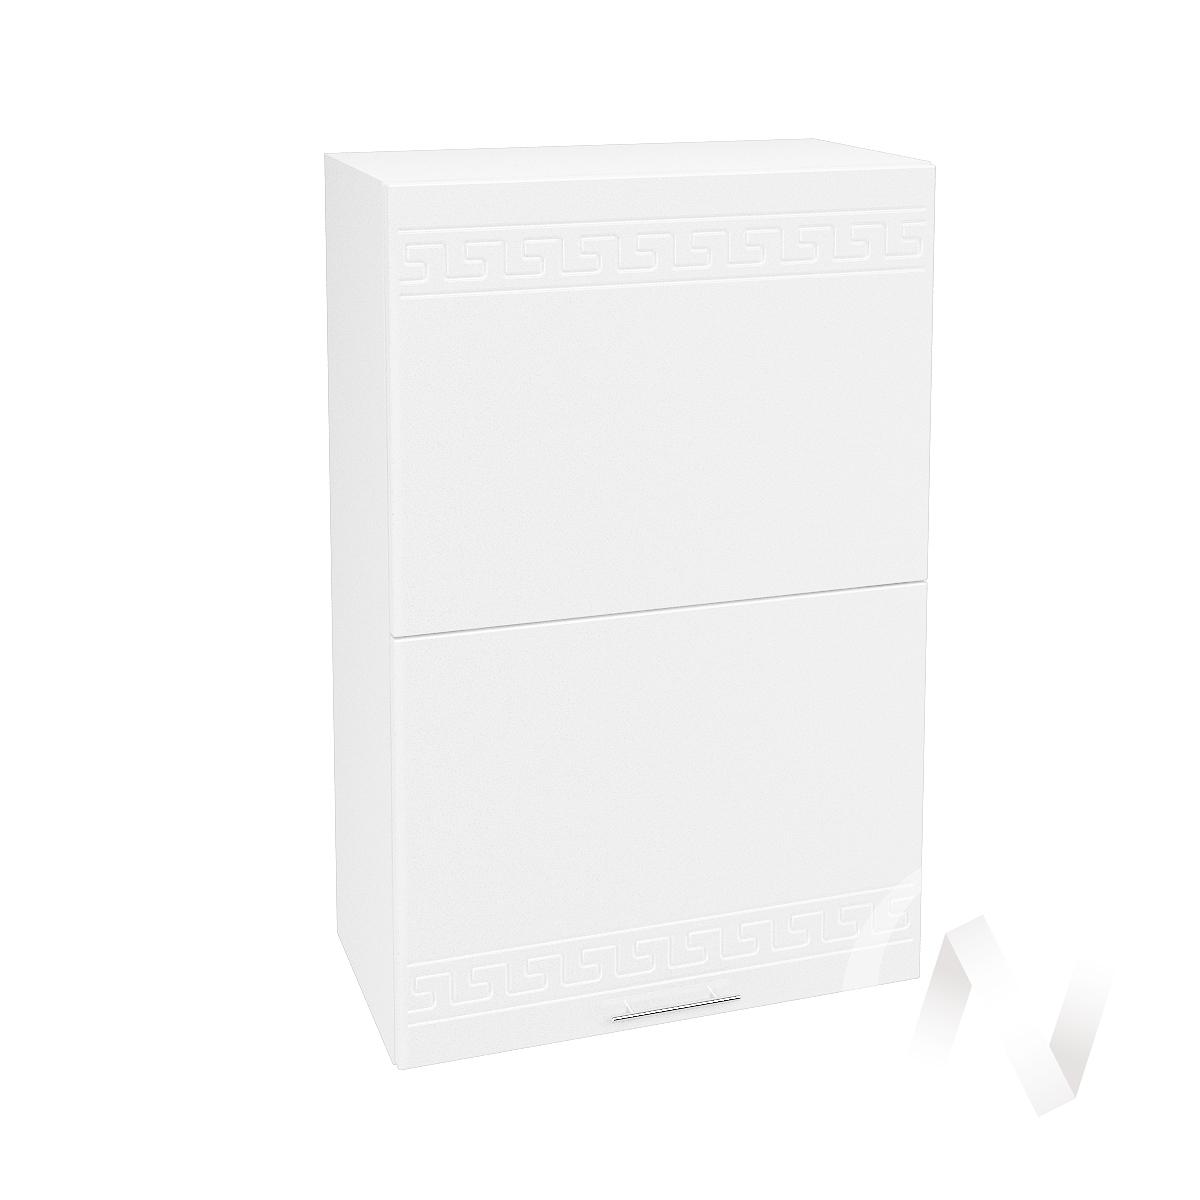 "Кухня ""Греция"": Шкаф верхний горизонтальный 602, ШВГ 602 (белый металлик/корпус белый)"